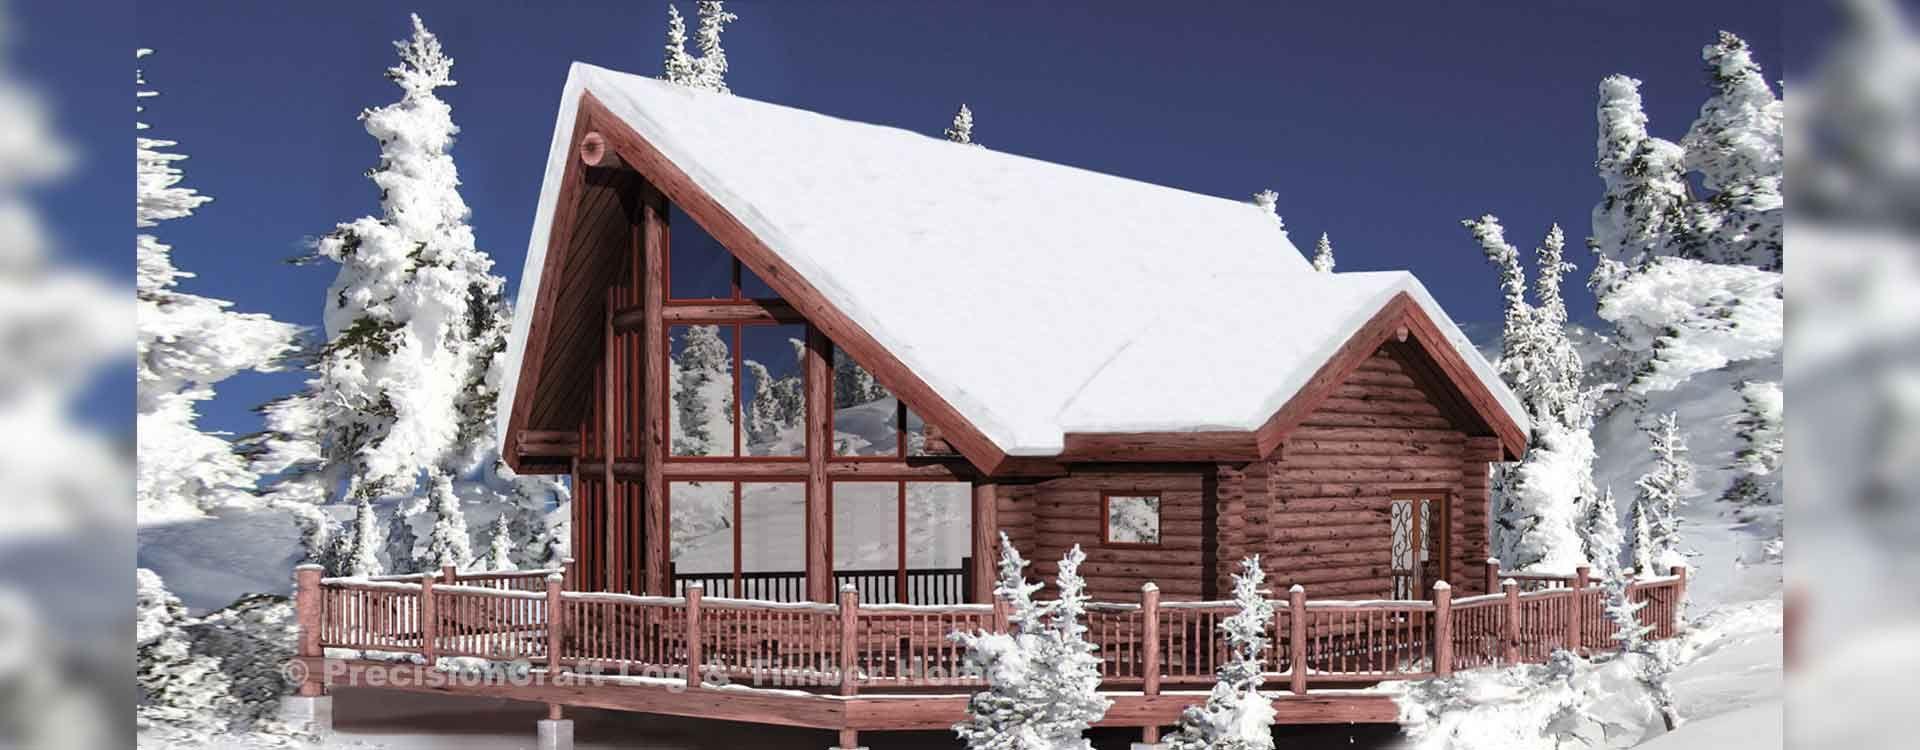 Yellowstone Log Home Plan Log Home Floor Plans Log Cabin Homes